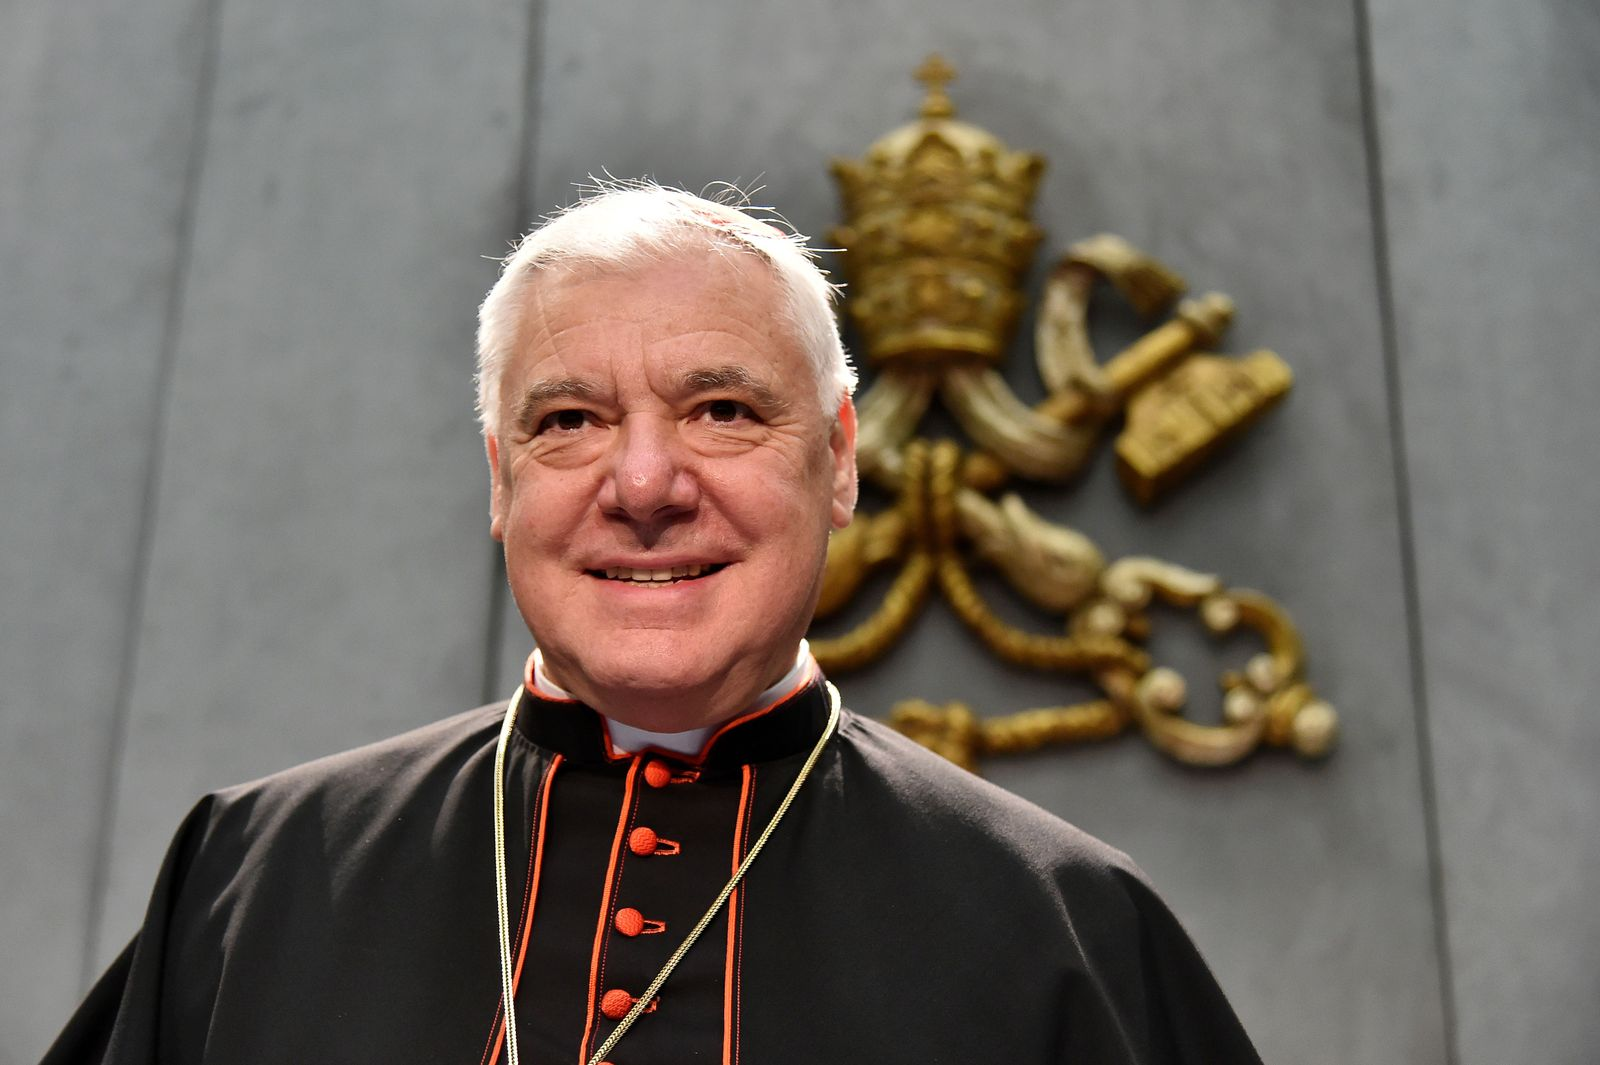 Cardinal Gerhard Ludwig Müller